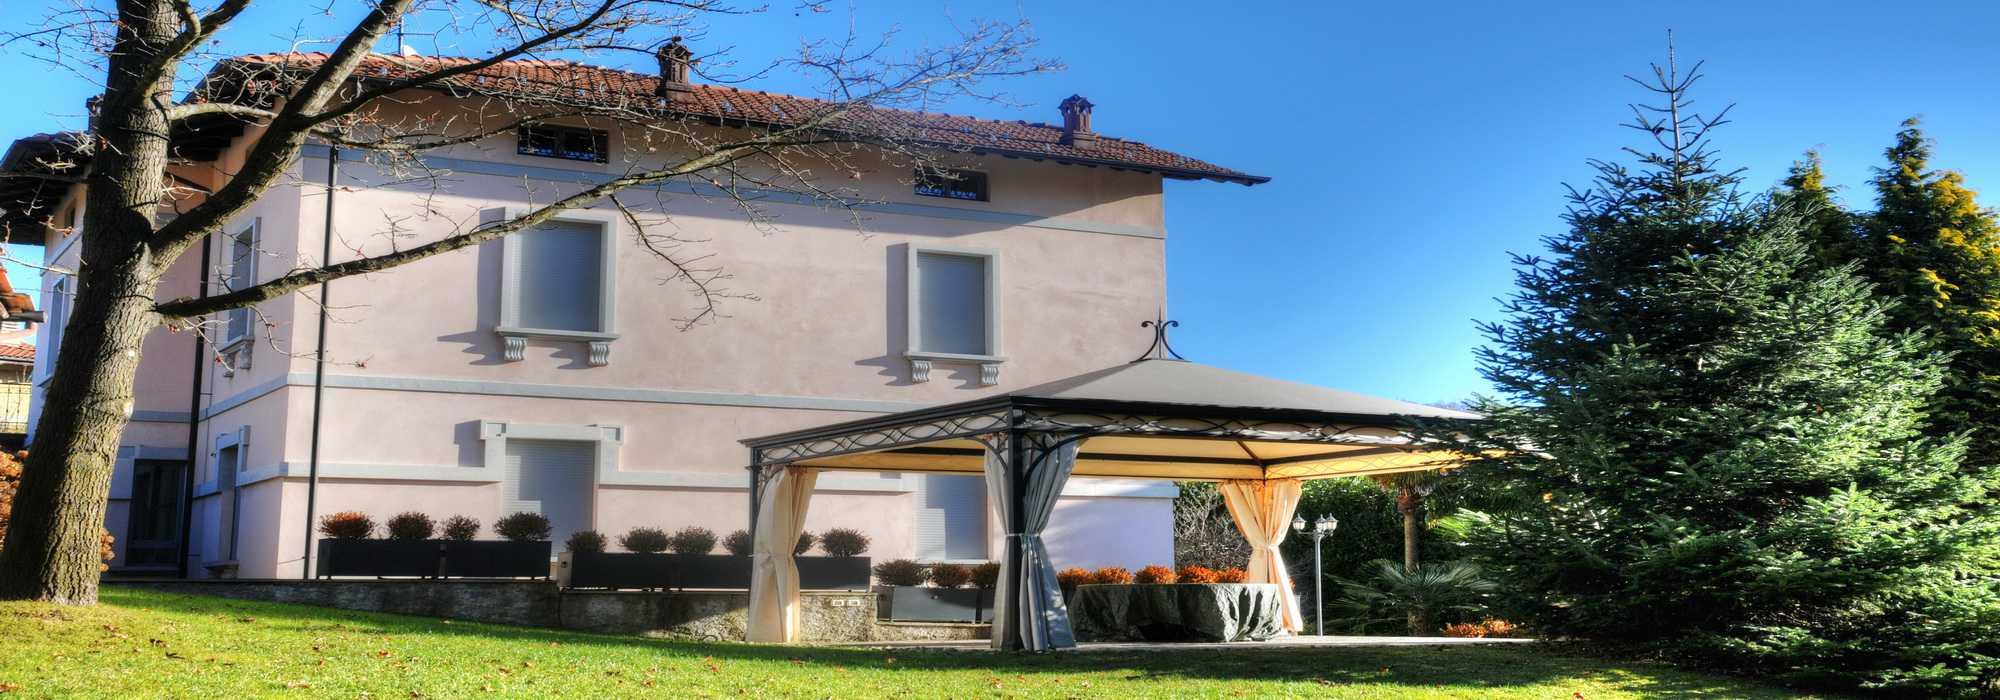 Villa d'epoca a Carpugnino